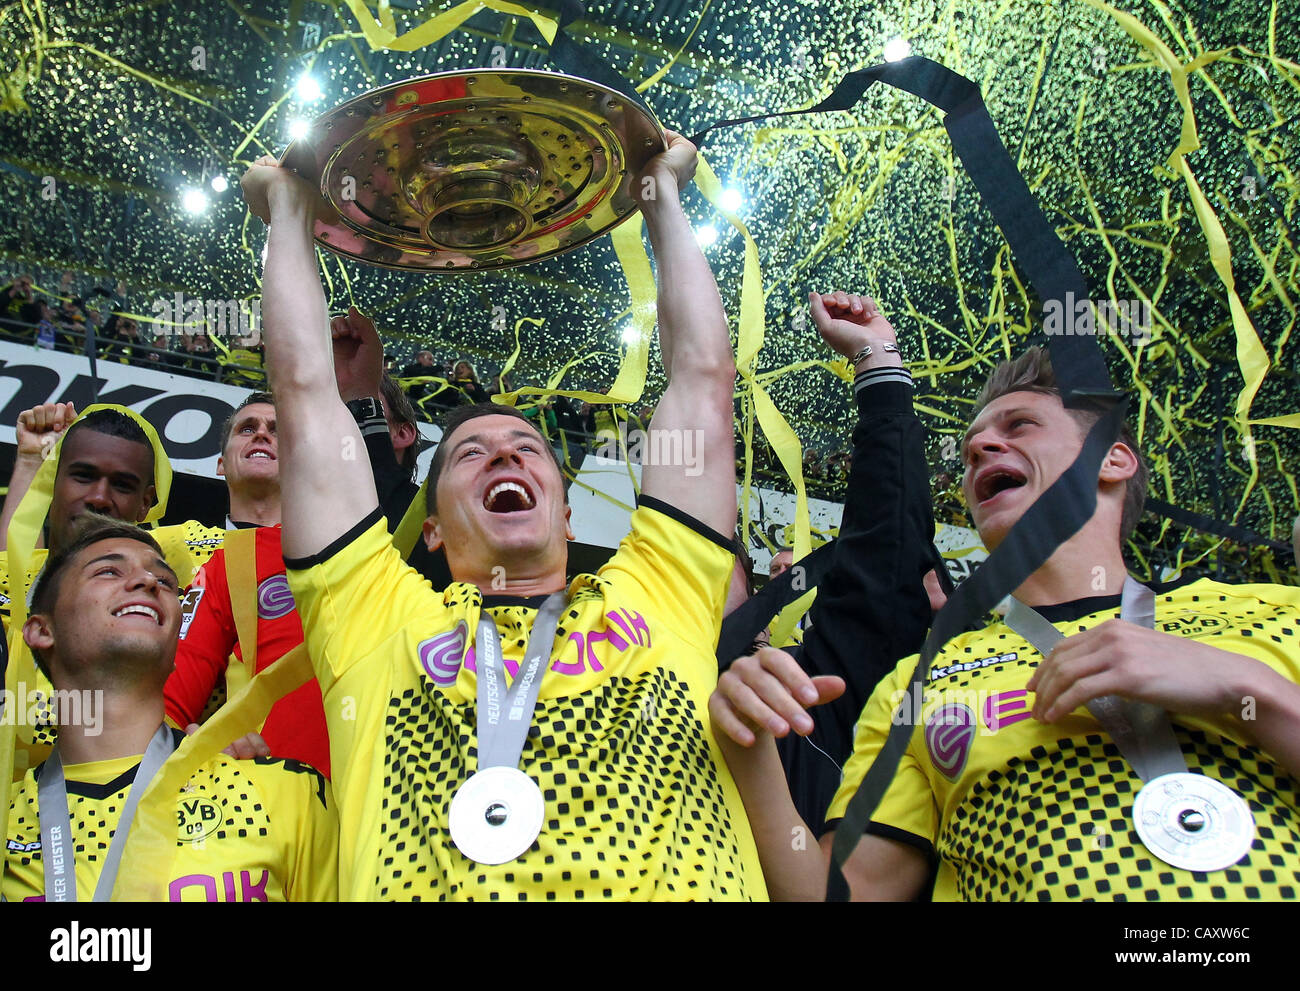 DORTMUND, GERMANY - MAY 05: Robert Lewandowski (C) of Dortmund lifts the trophy after winning the german championship - Stock Image